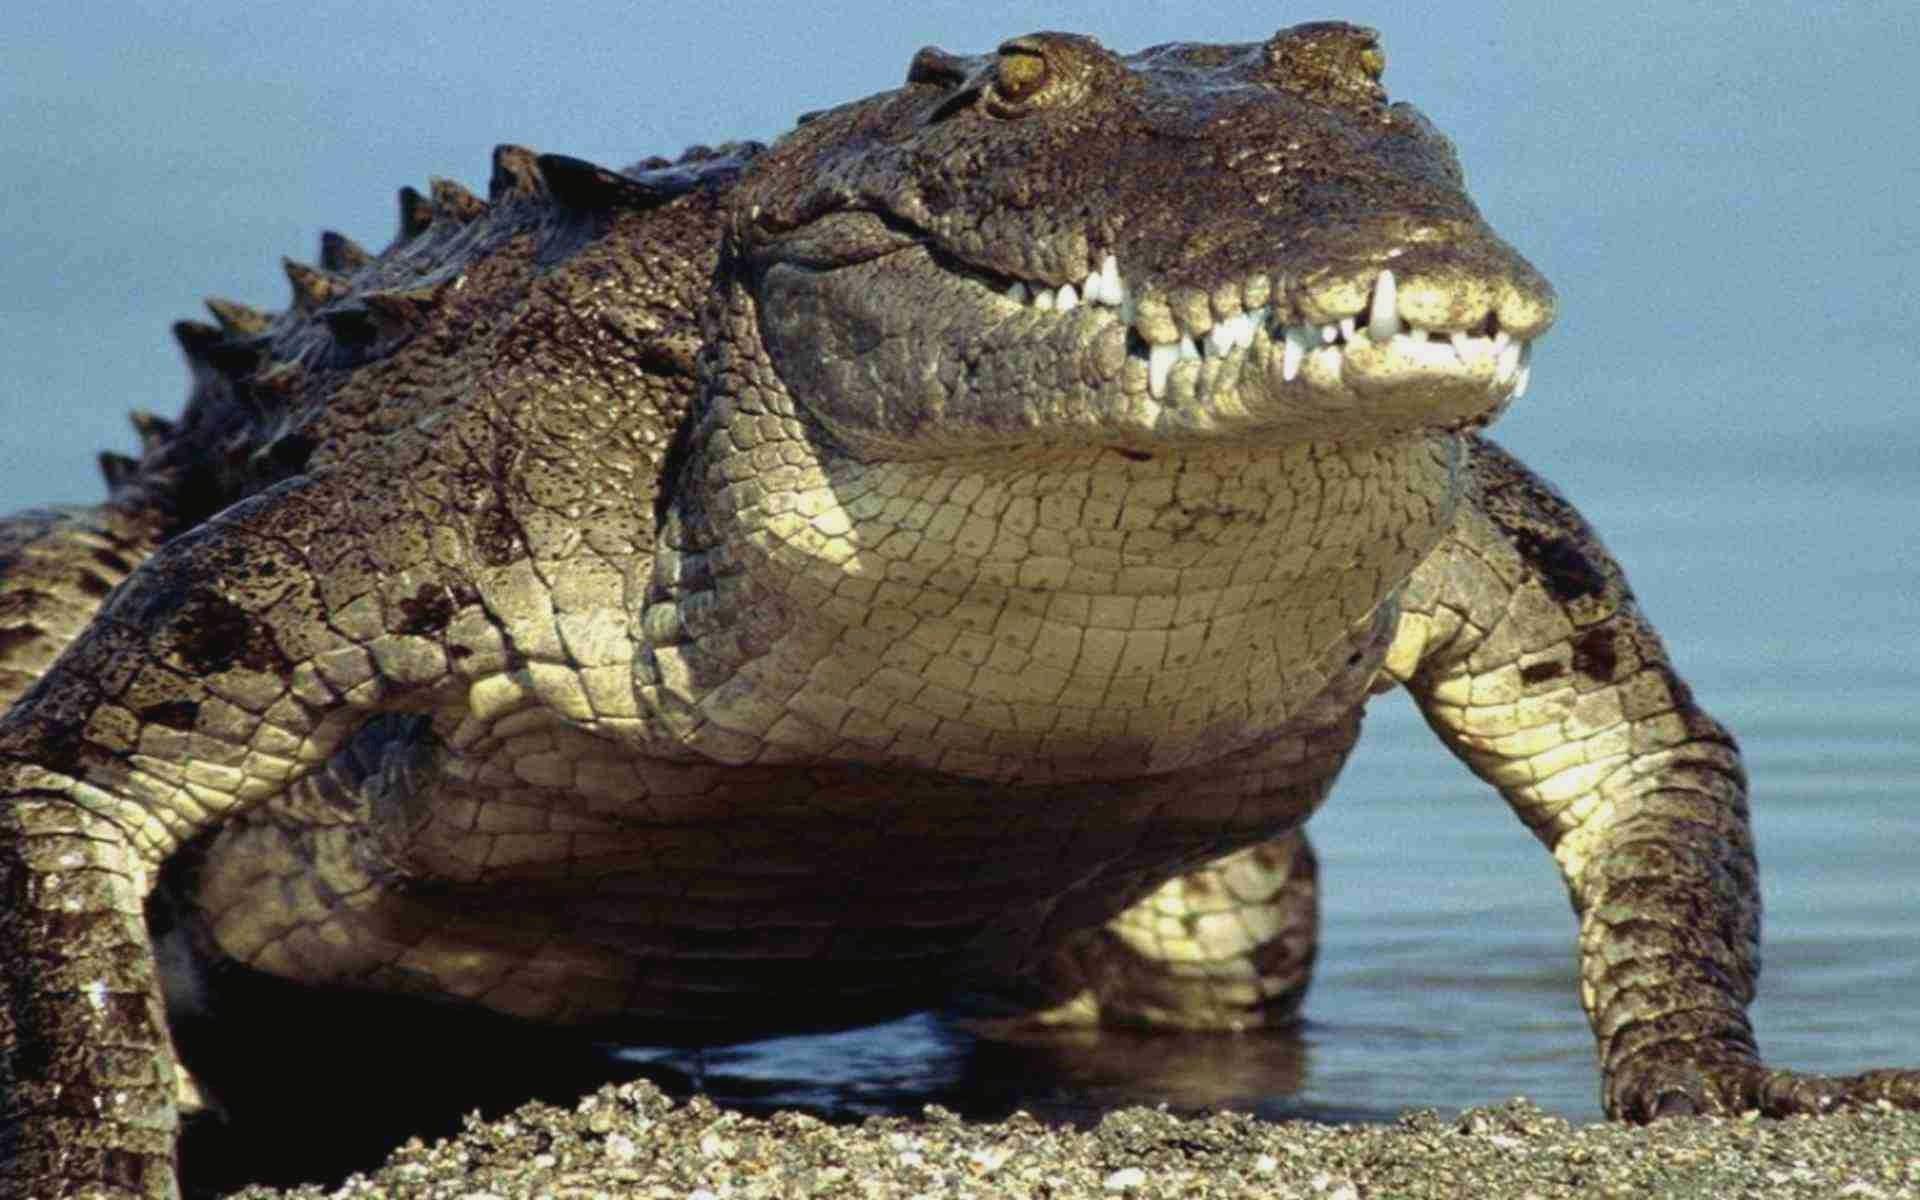 crocodile wallpaper hd download